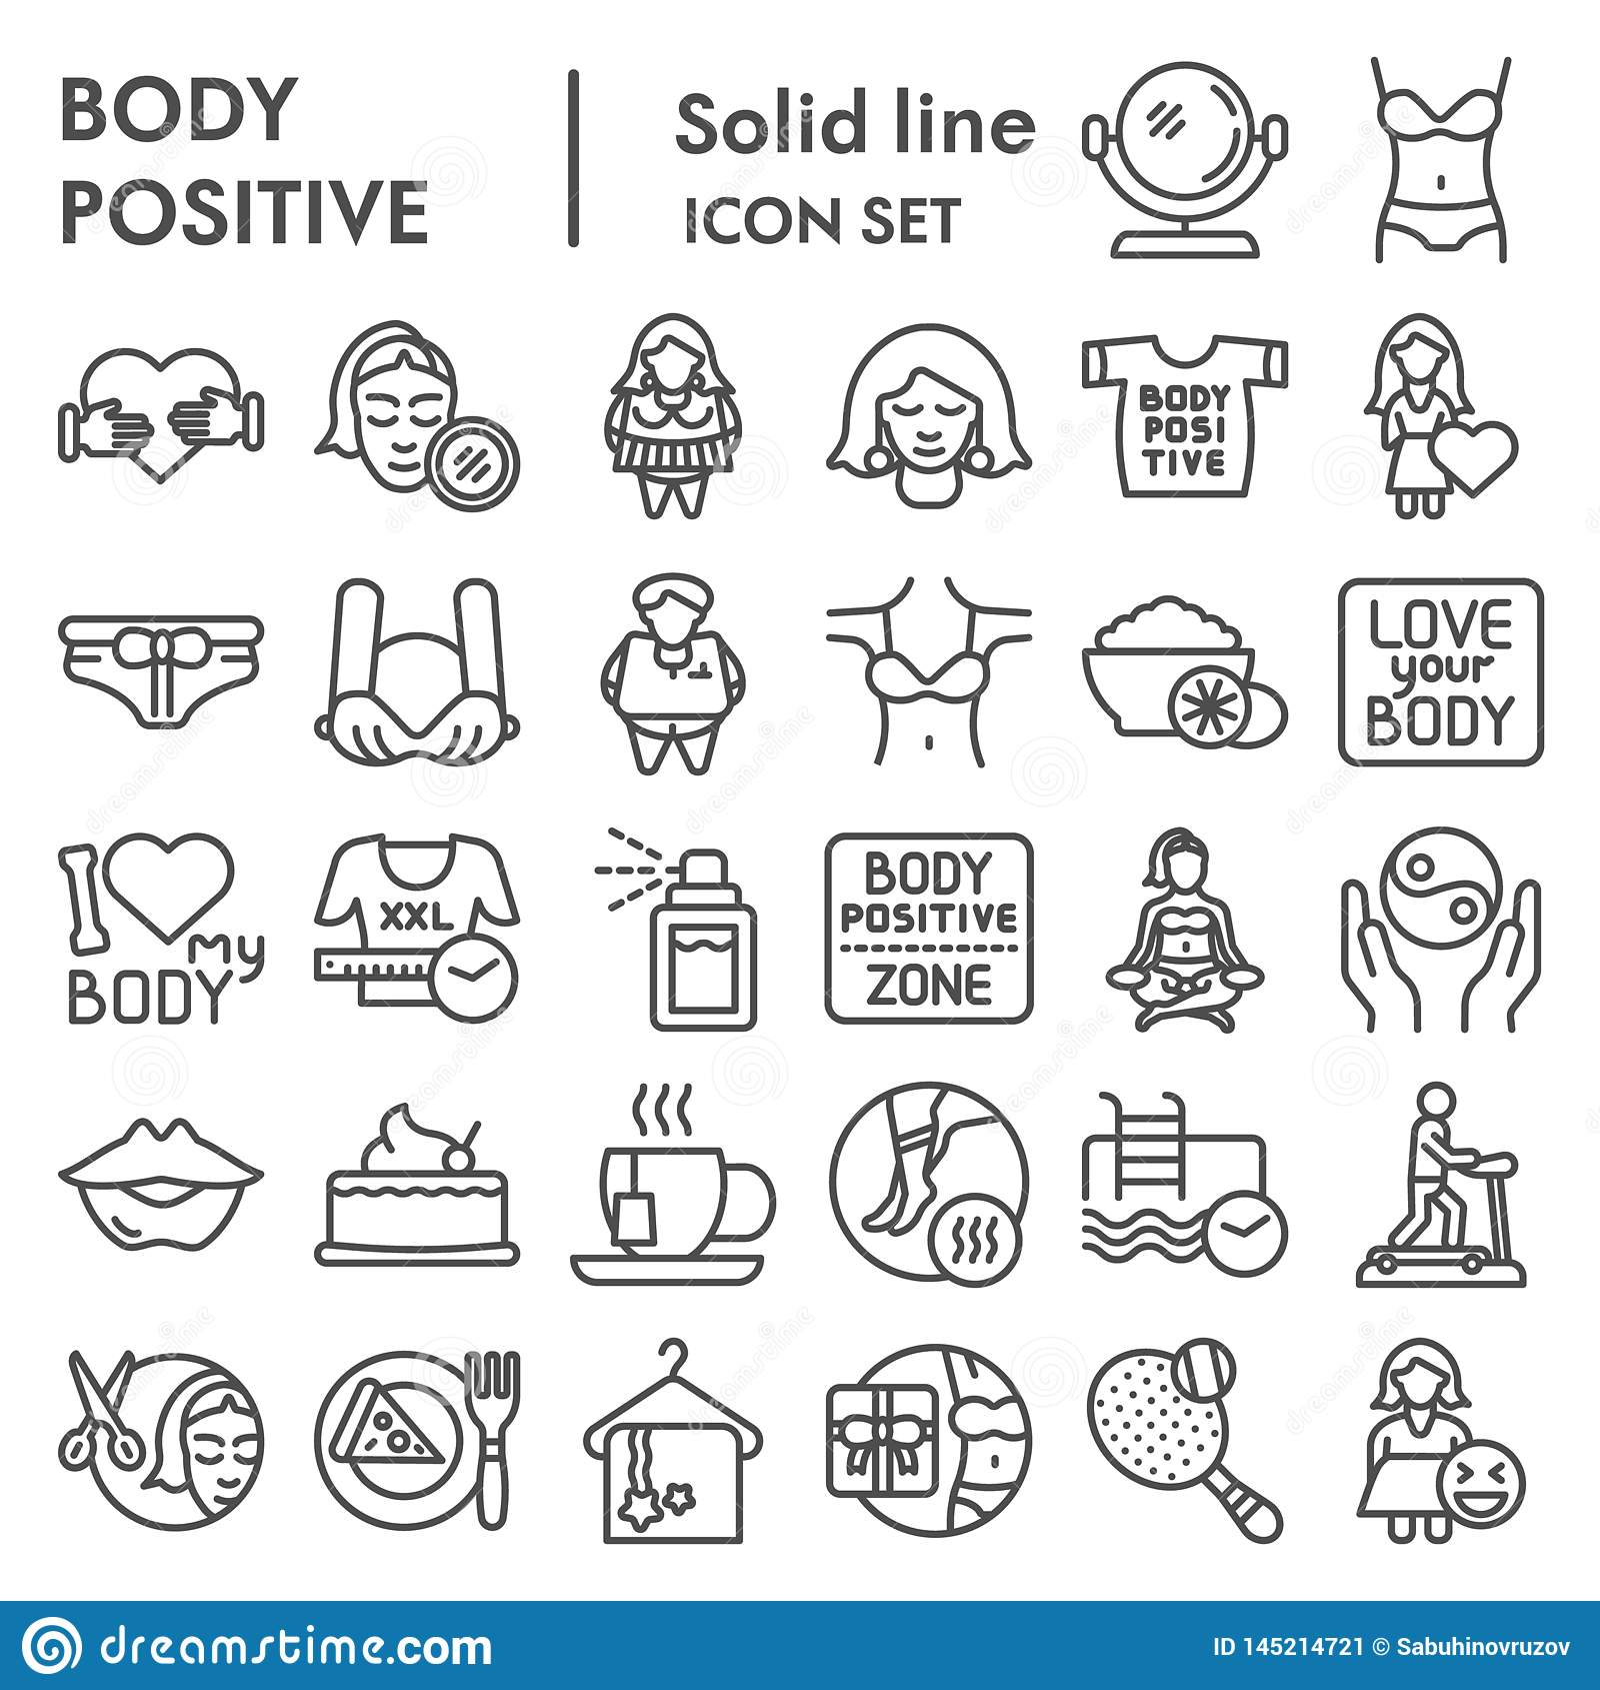 Body Positive Line Art